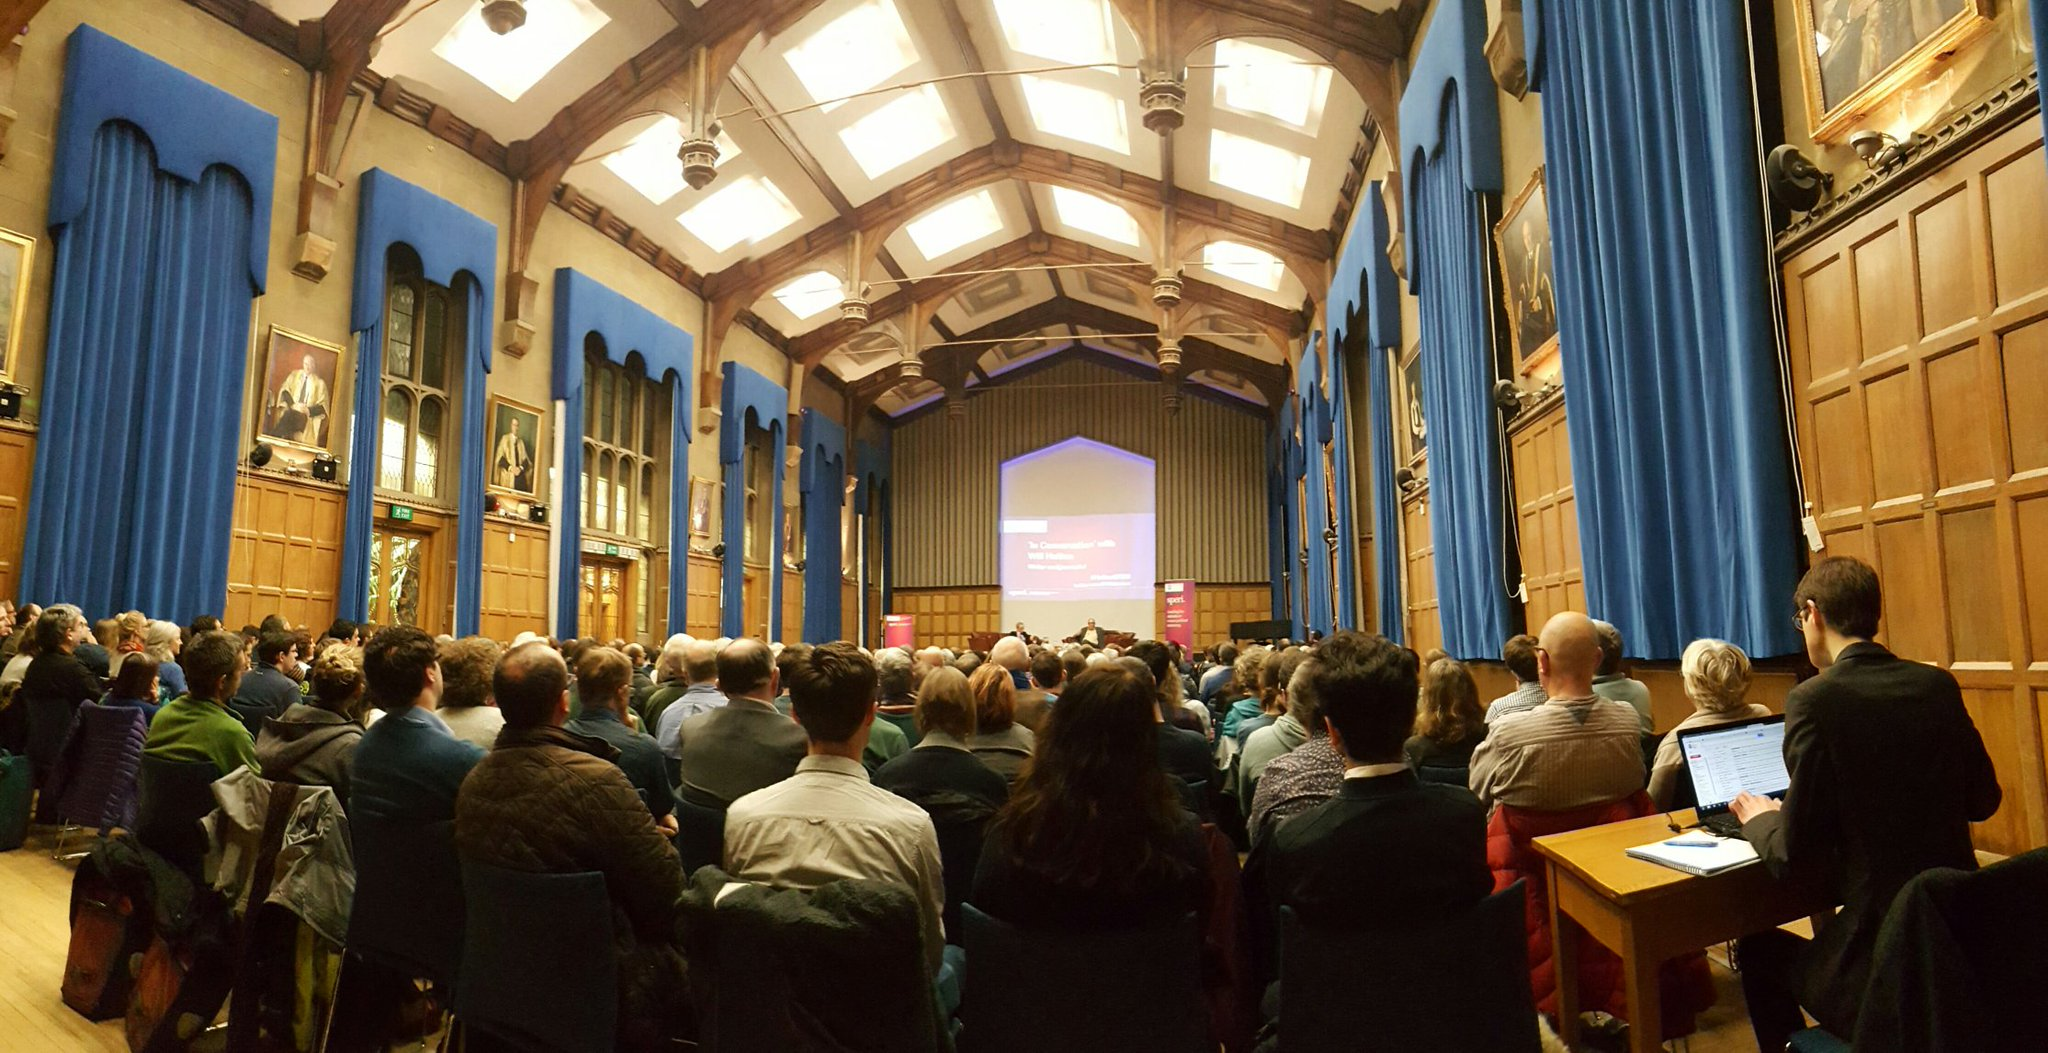 Full house for 'In Conversation with @WilliamNHutton' for @SPERIshefuni in Firth Hall @sheffielduni tonight #HuttonSPERI https://t.co/tYEu76SFNB